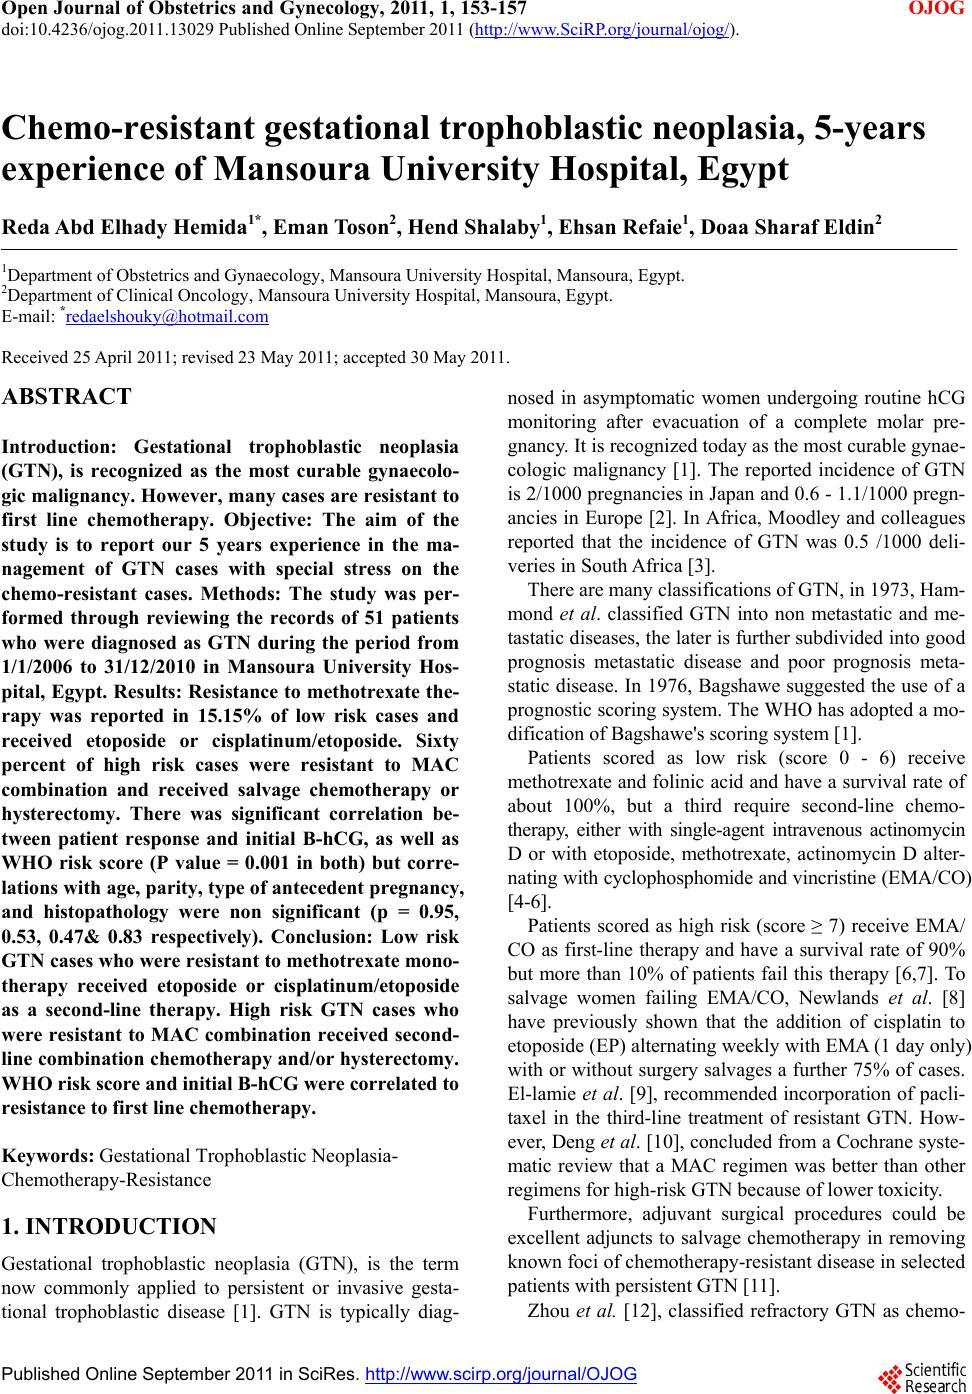 trophoblastic thesis [1950] the unitarian or trophoblastic thesis of cancer by ernst t krebs, jr, ernst t krebs, sr, and howard h beard the nature of cancer by ernst t krebbs external.